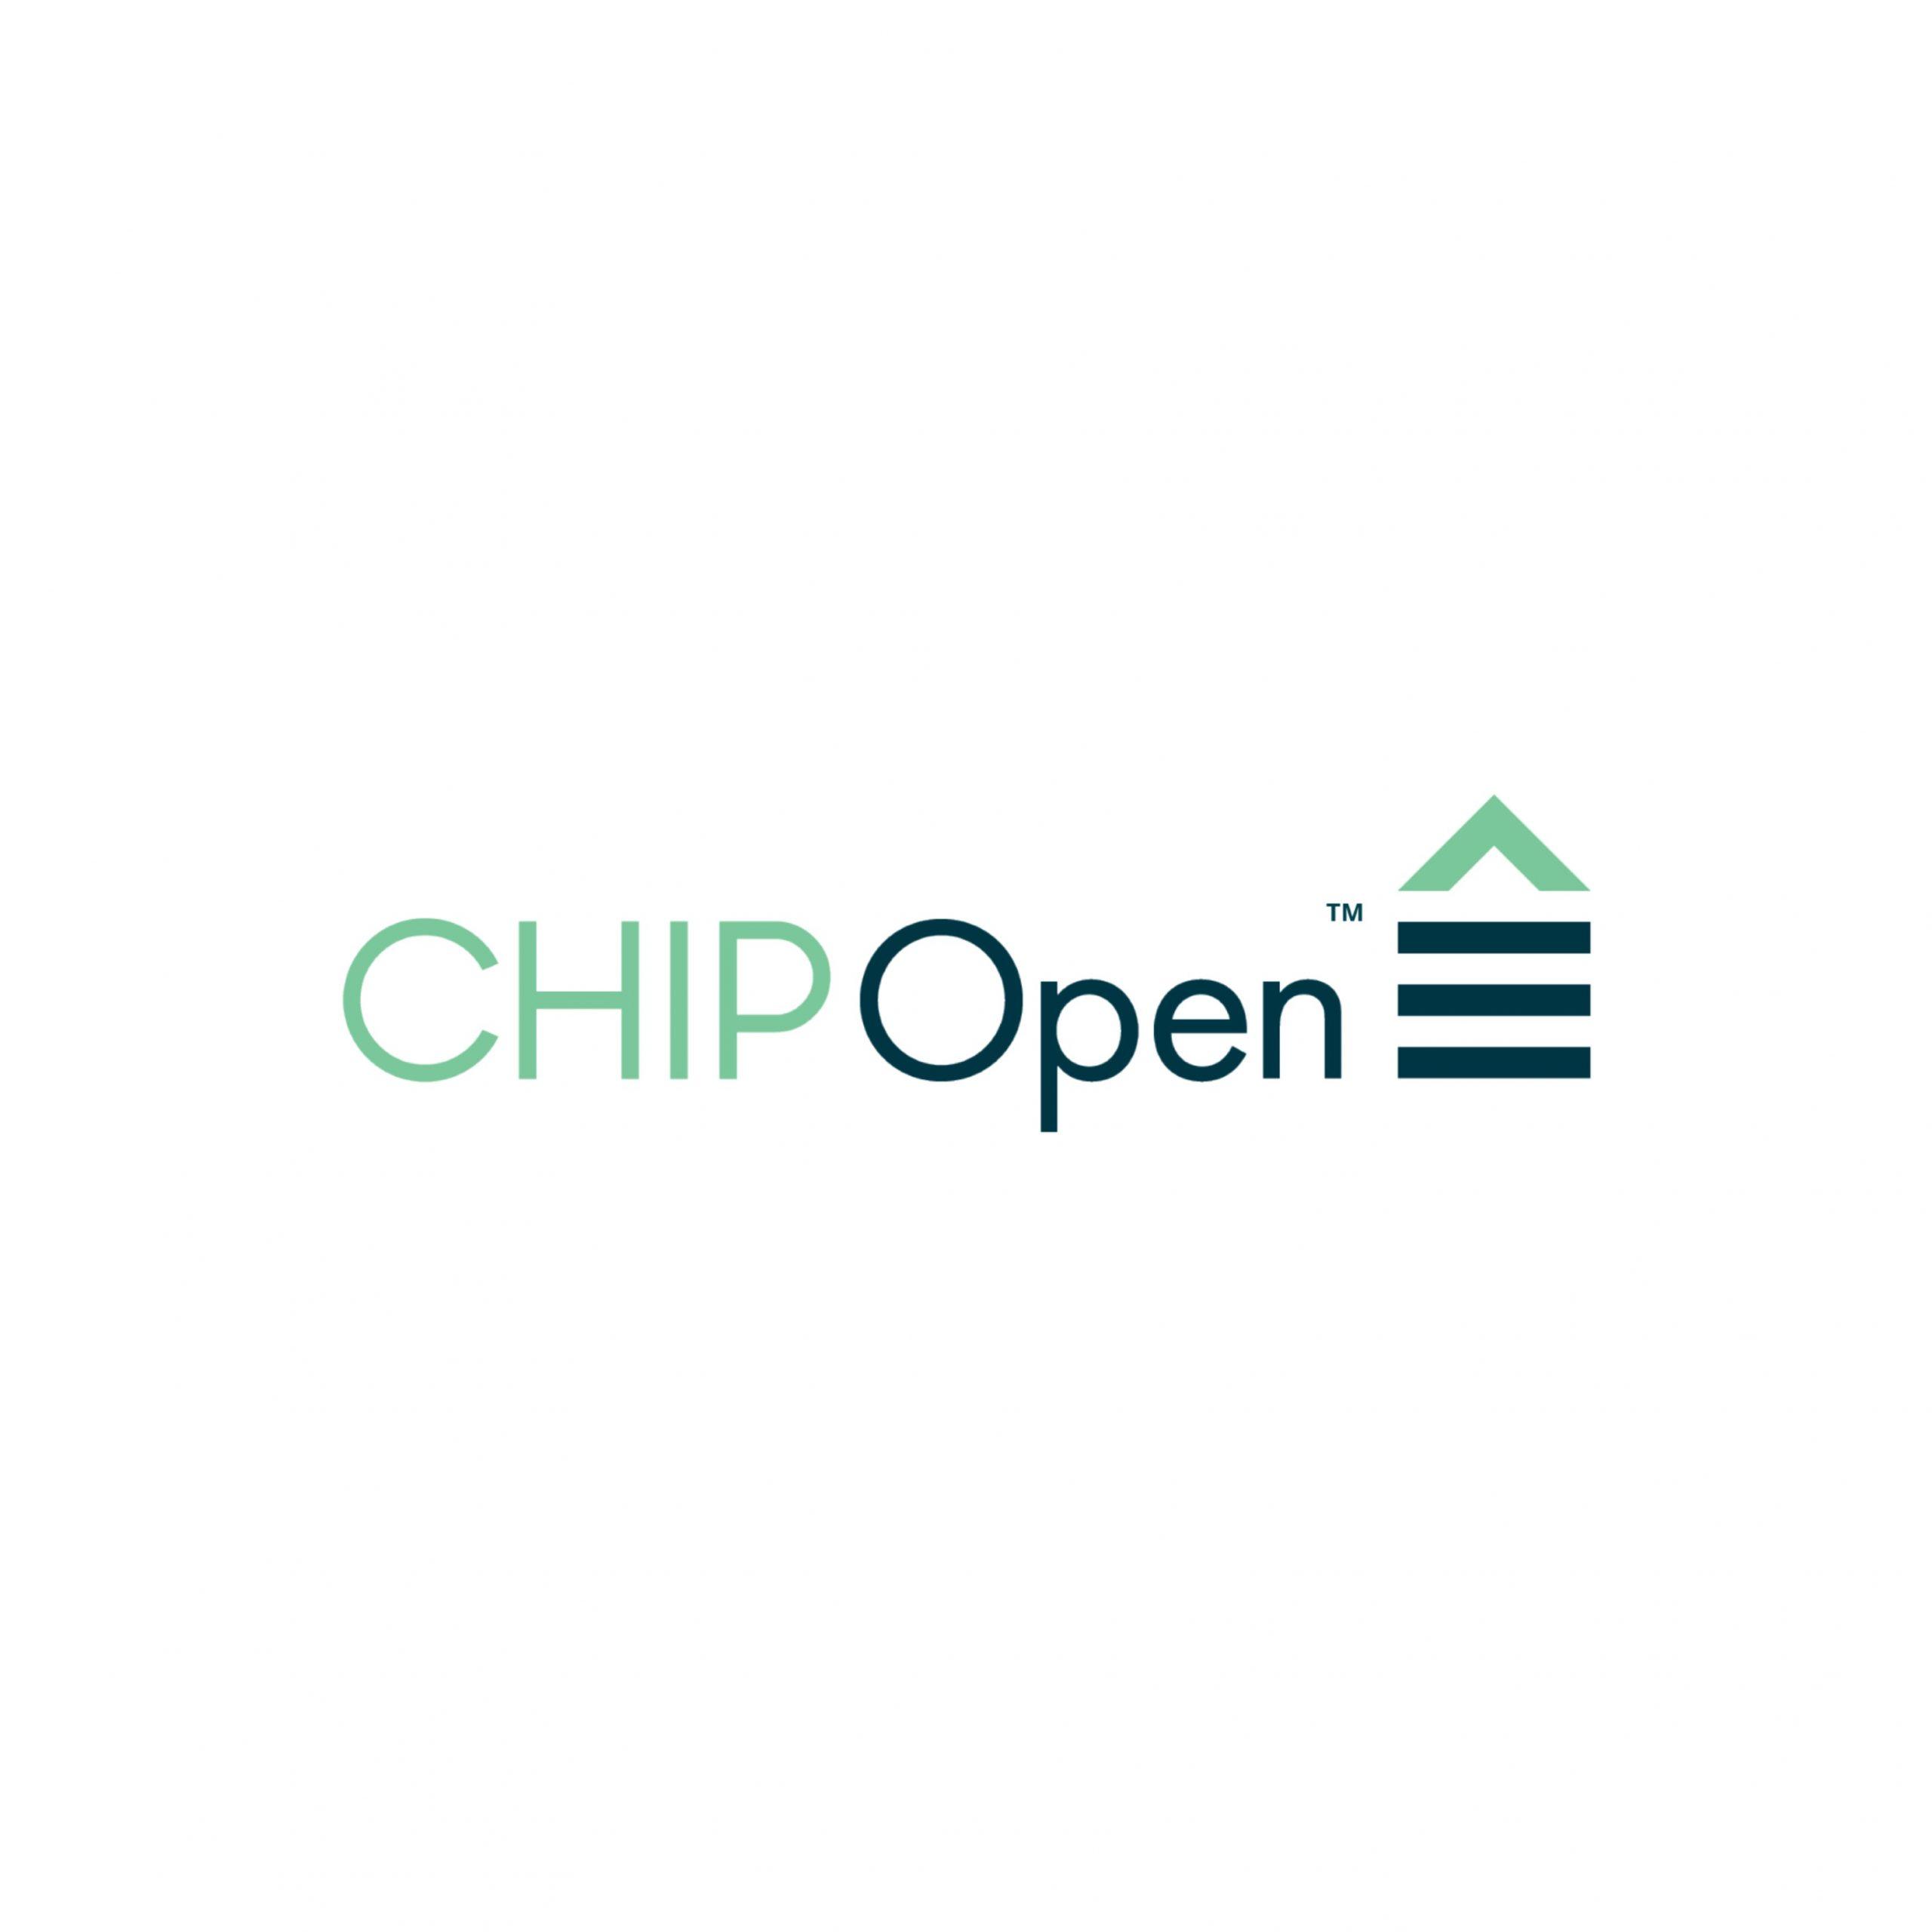 CHIP Open Logo